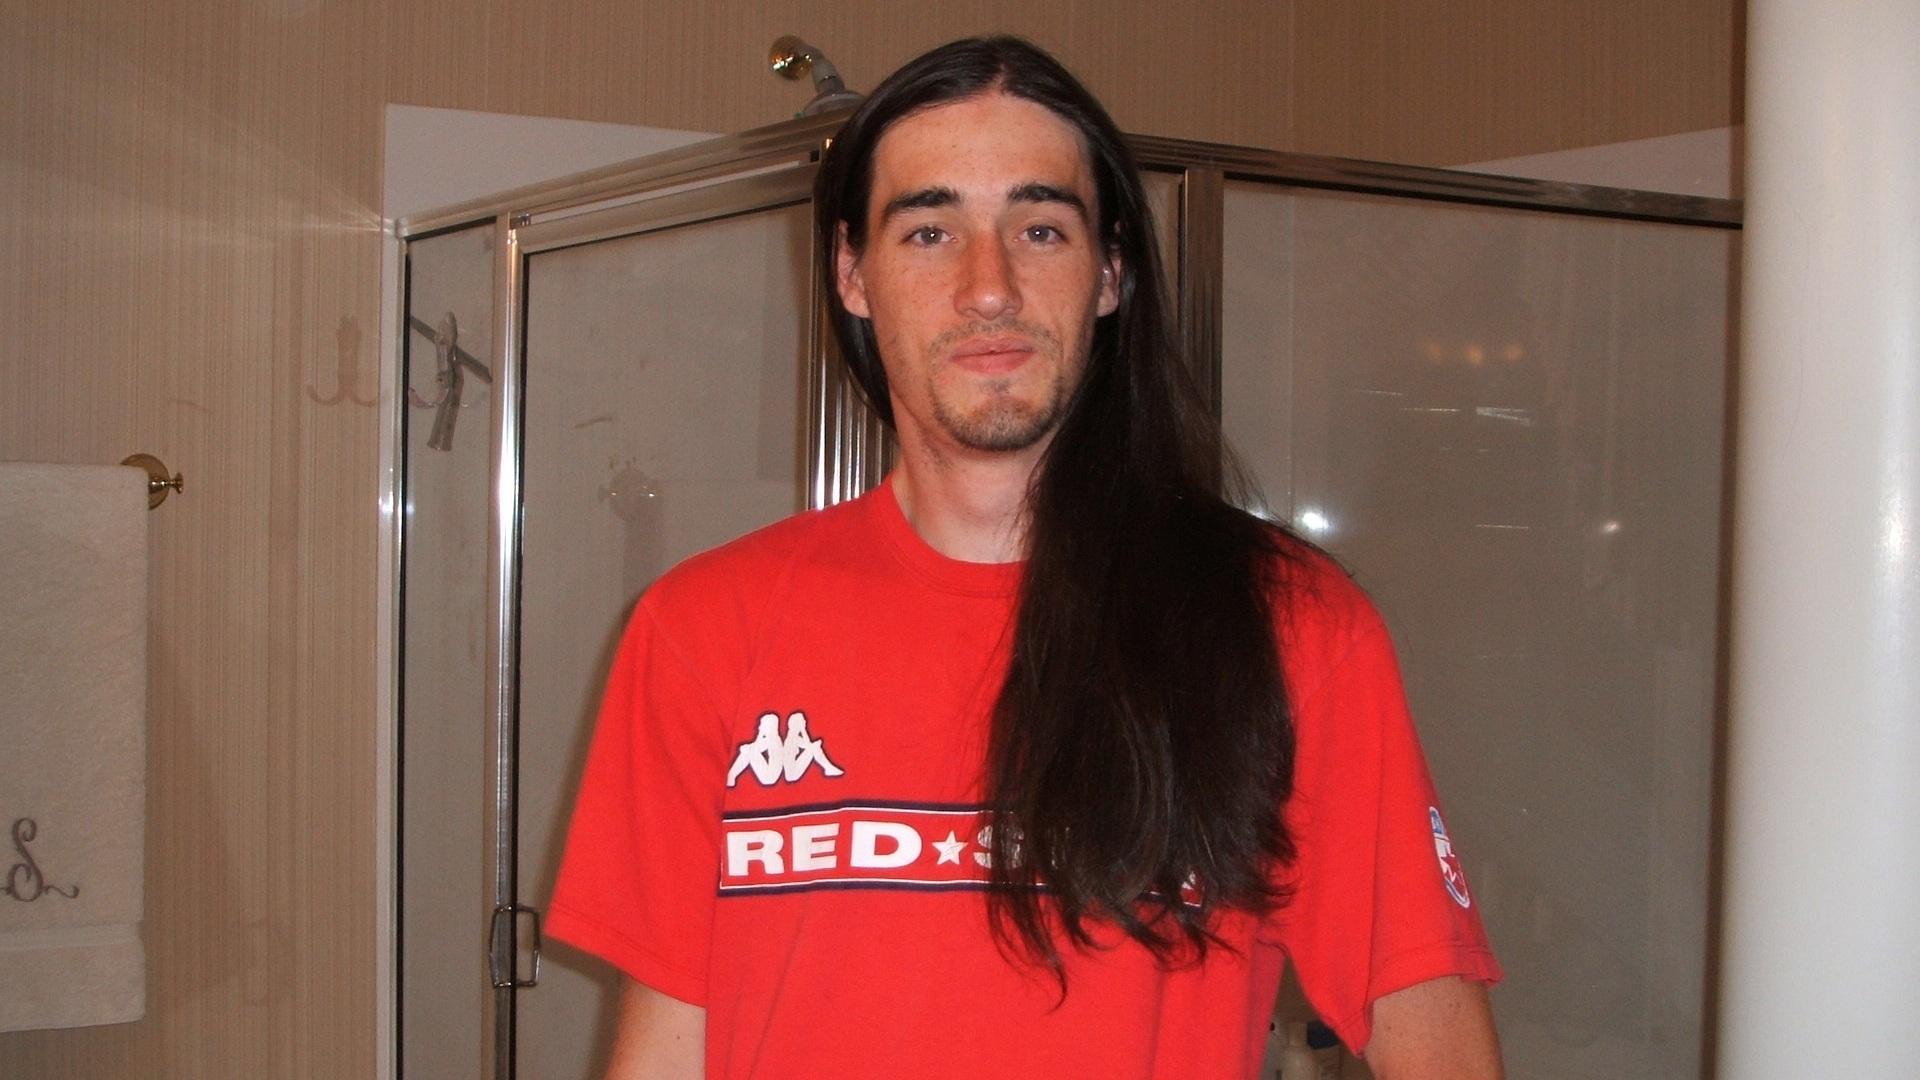 ALB_Me_Hair.JPG